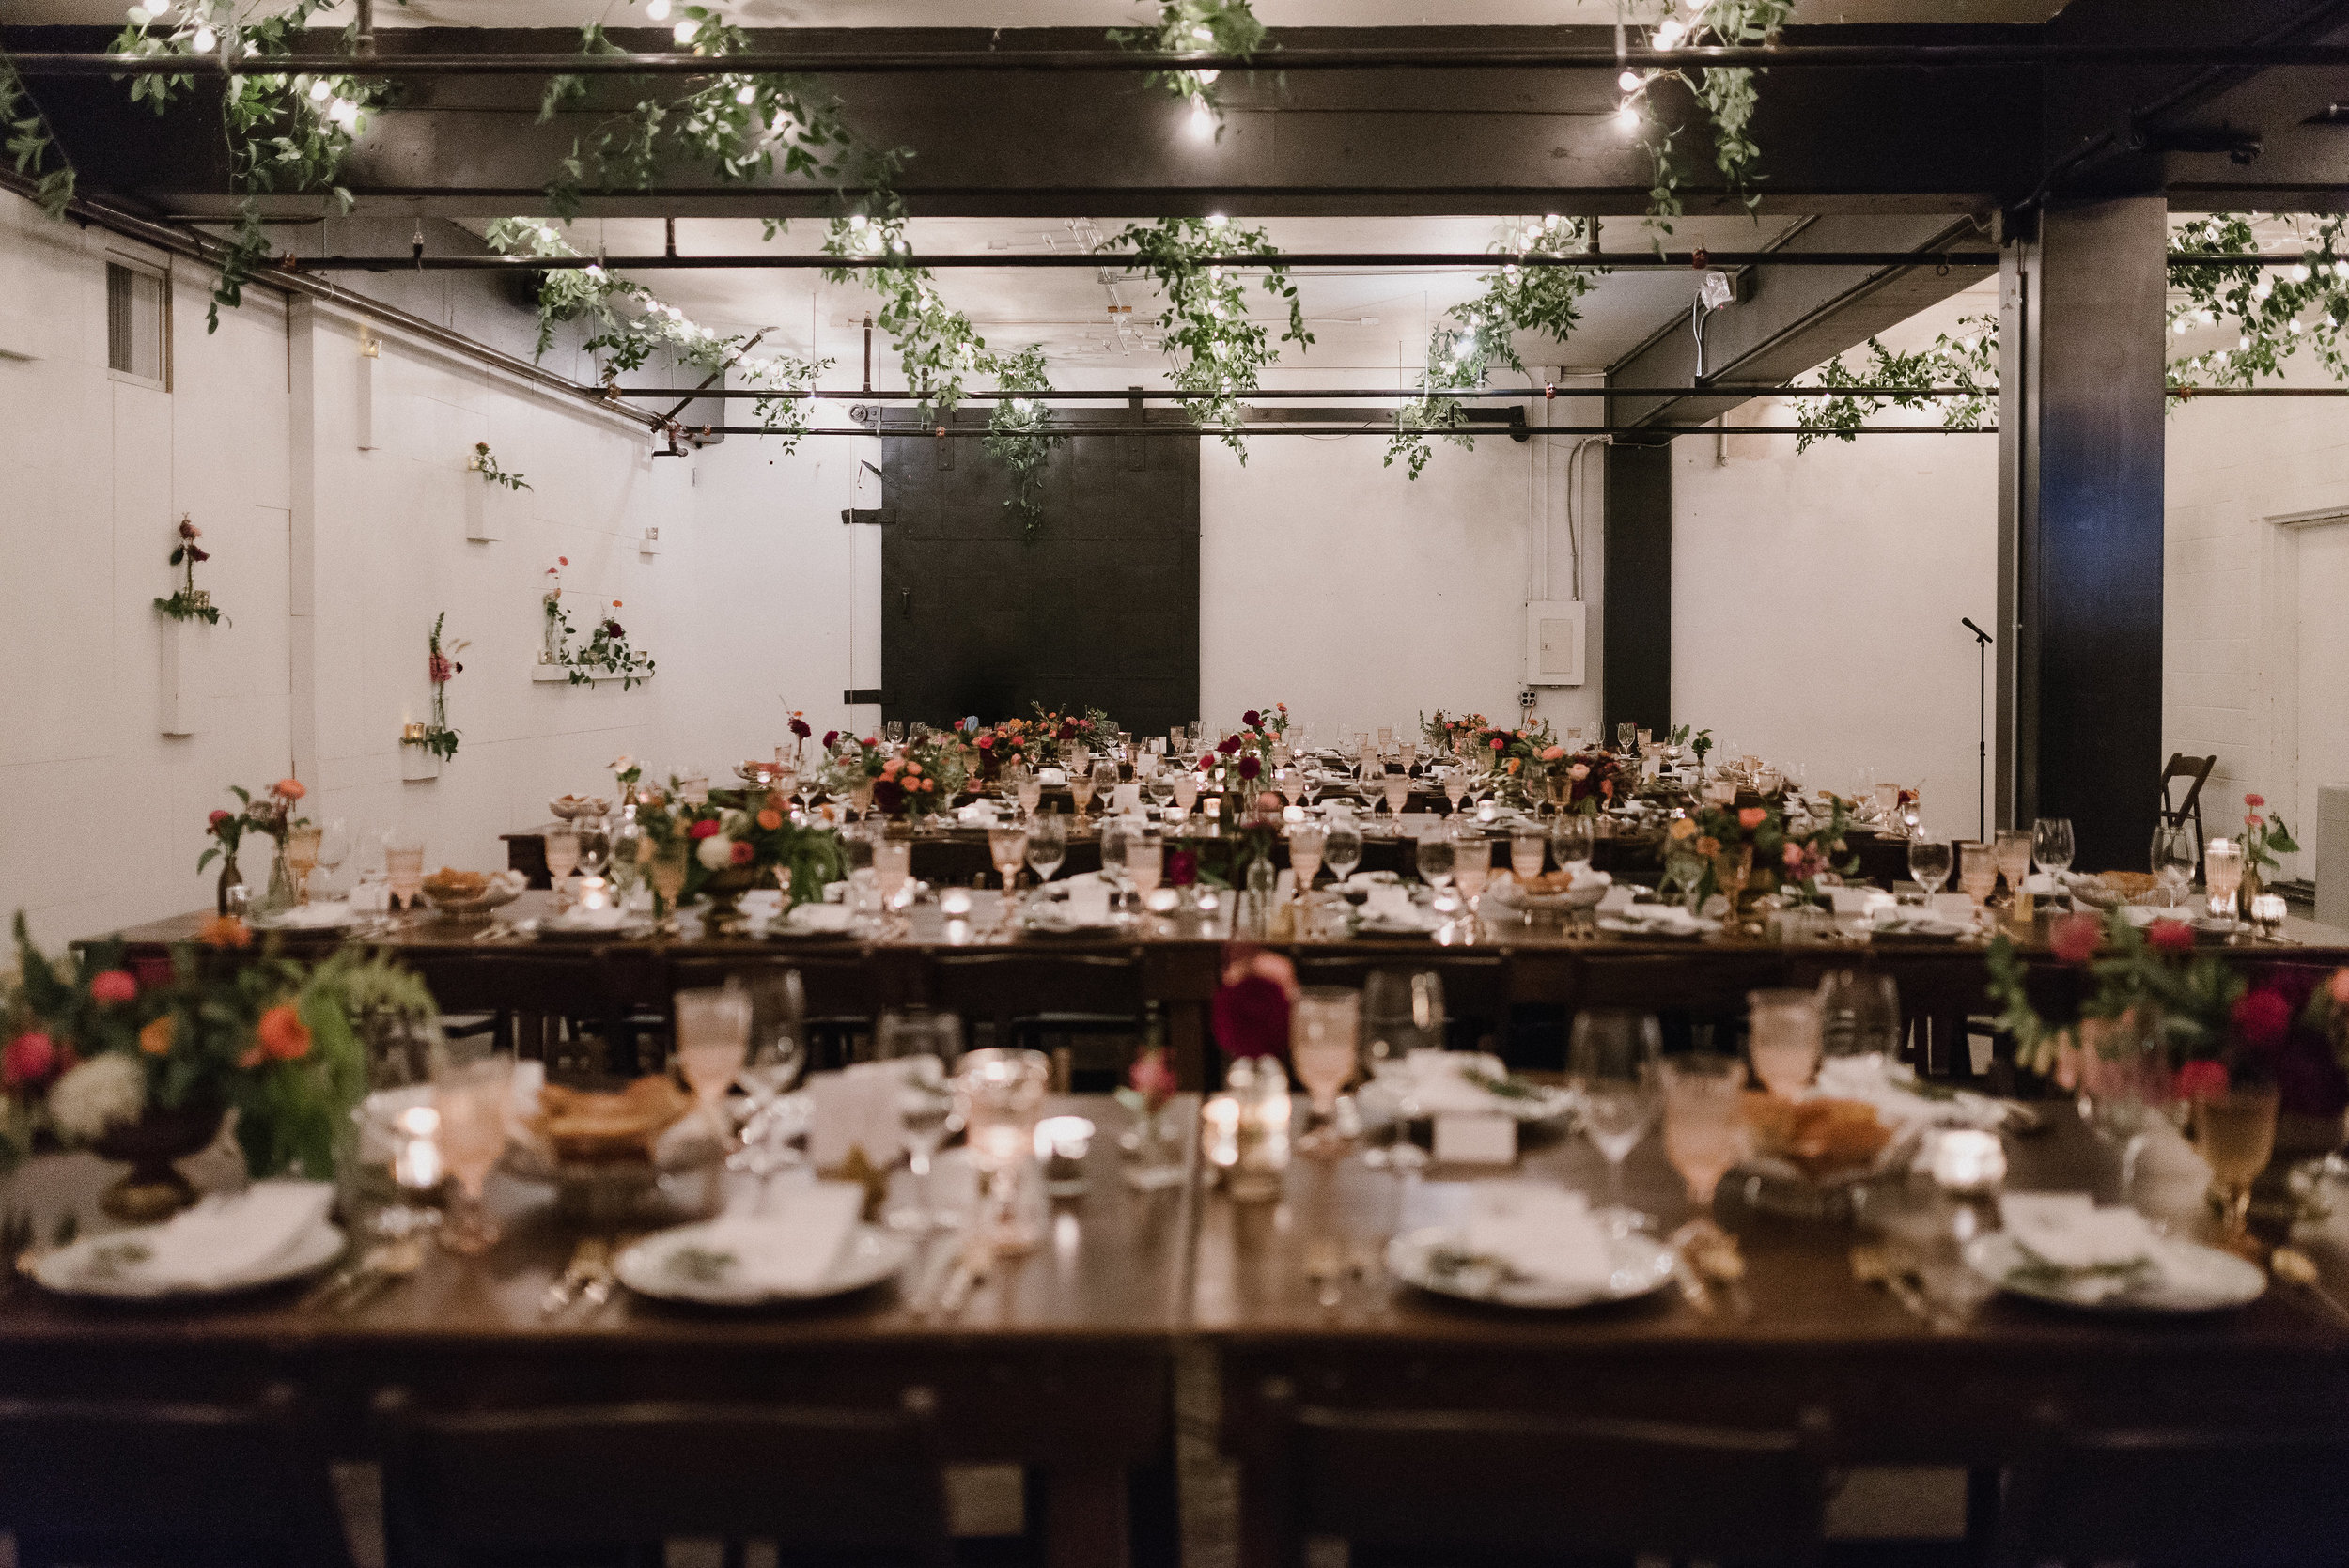 floral-ceiling-reception.jpg